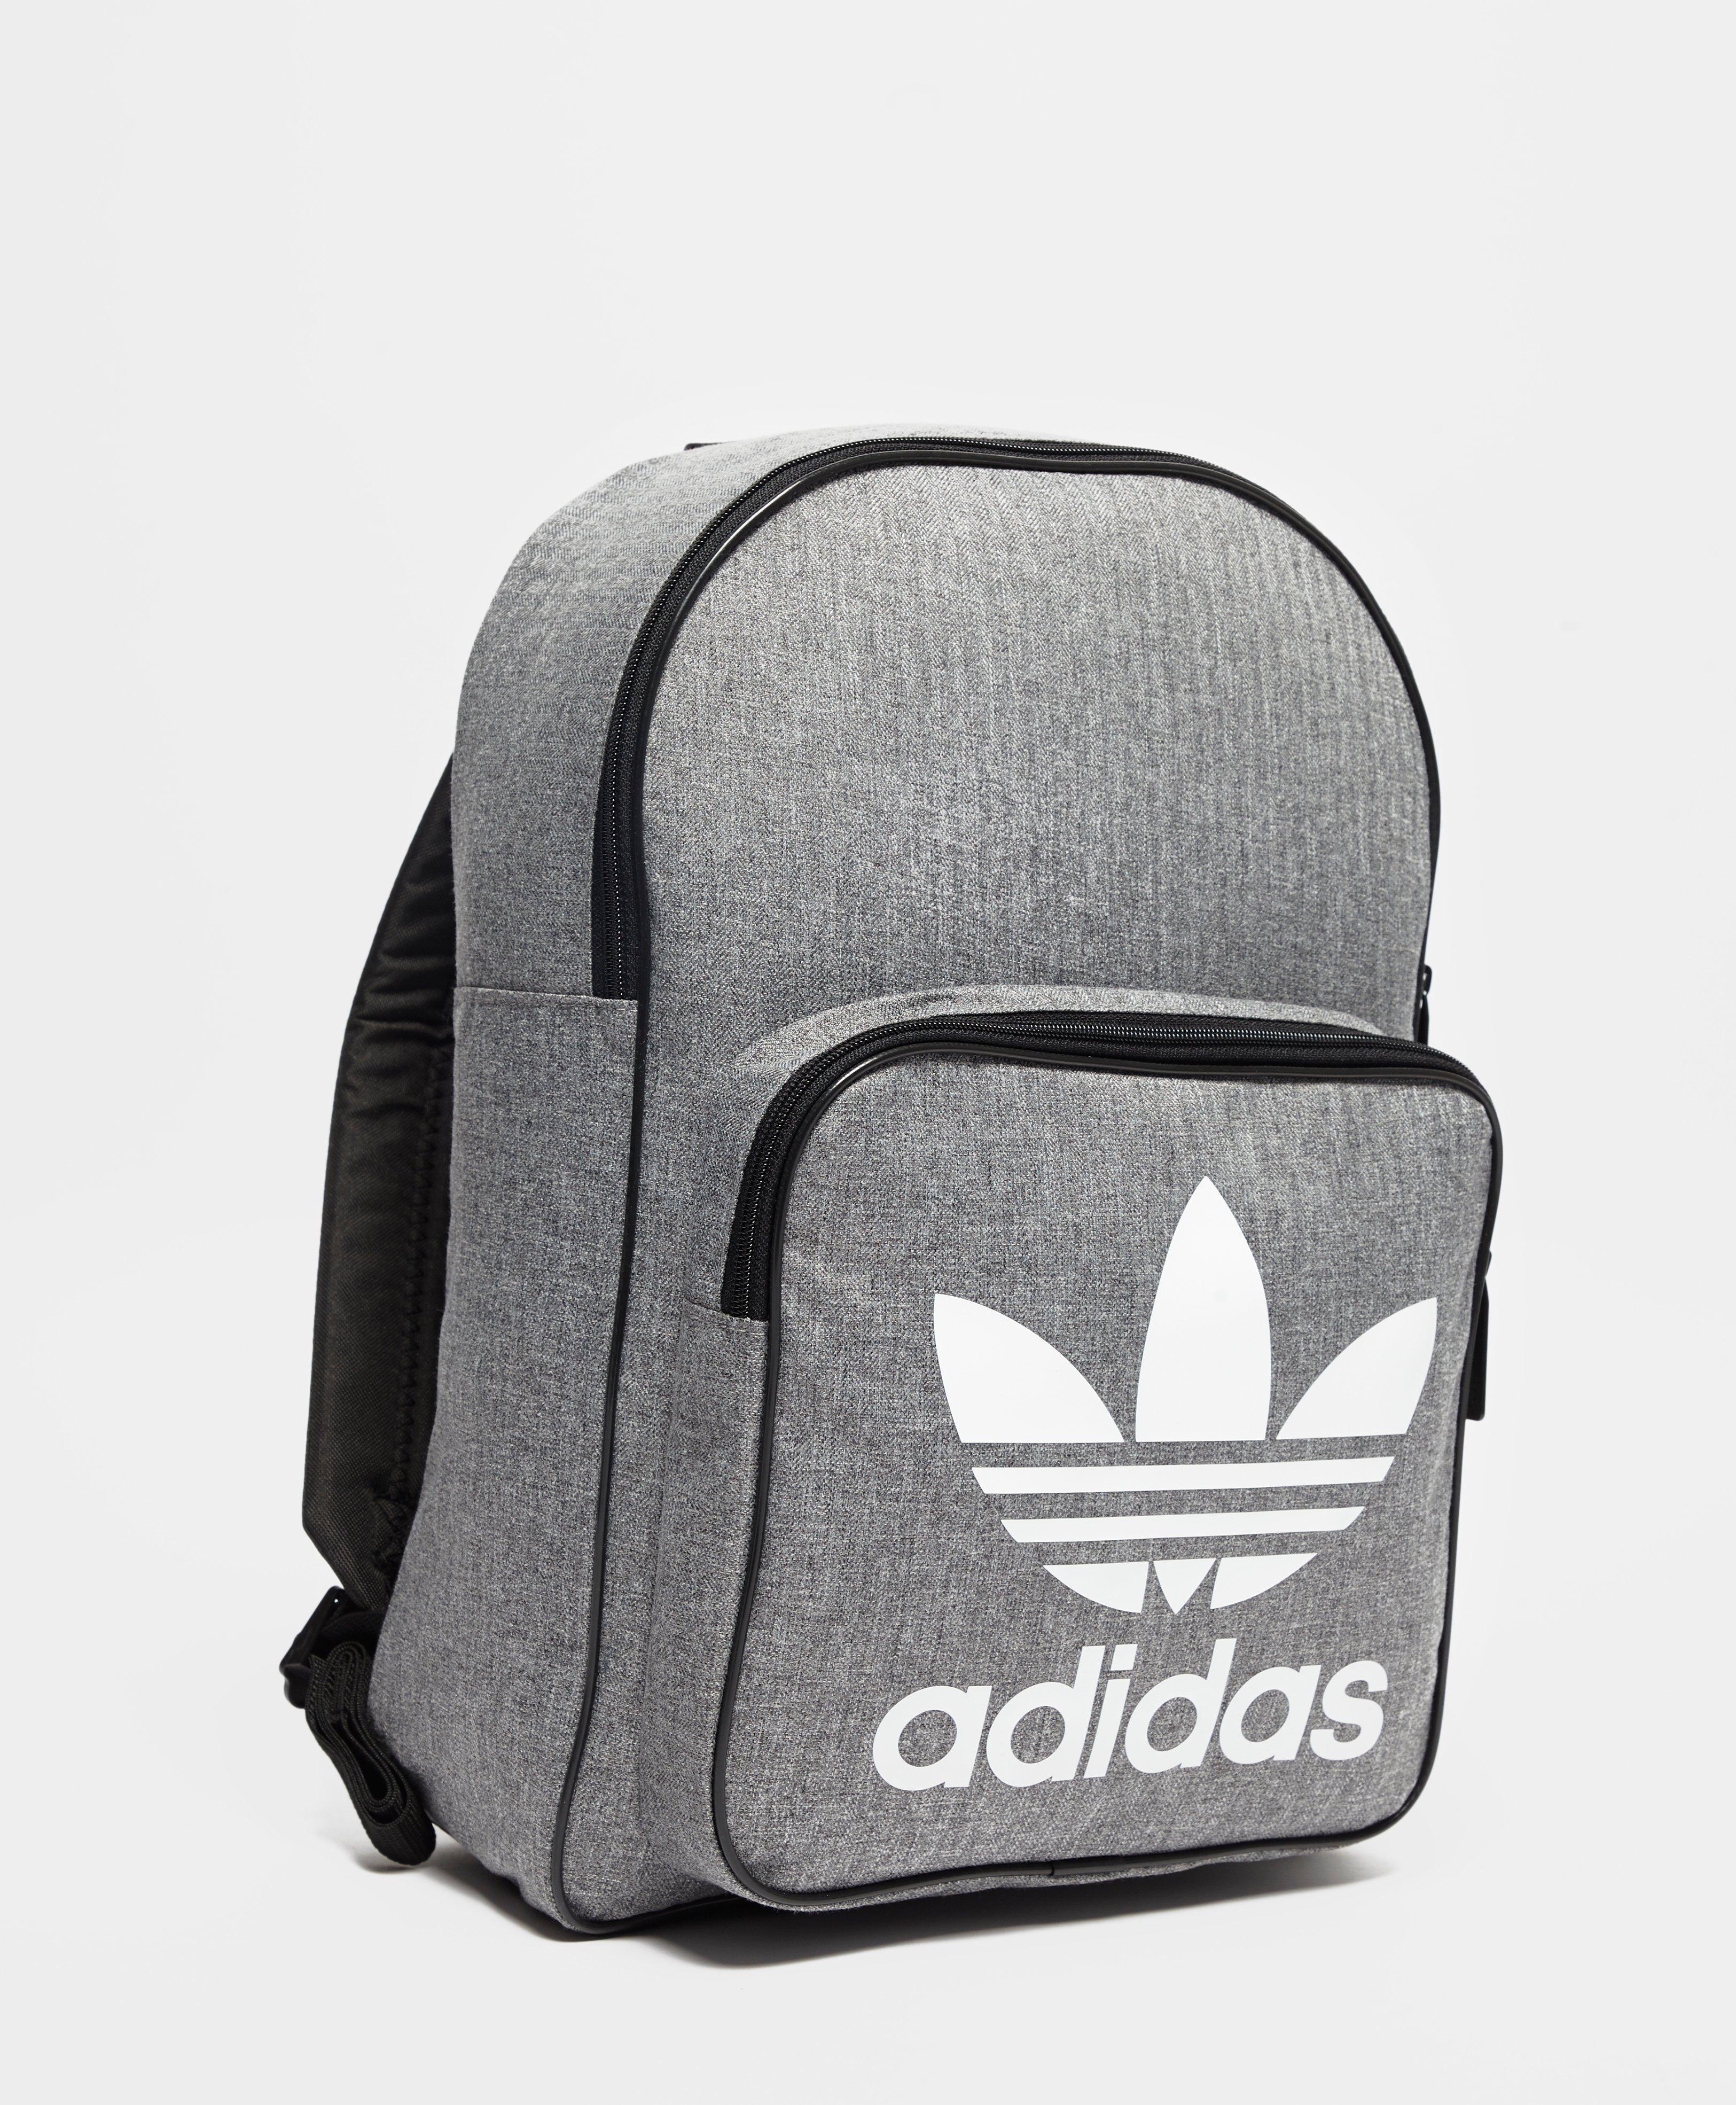 12f06870c1fe adidas Originals Classic Trefoil Backpack in Gray for Men - Lyst